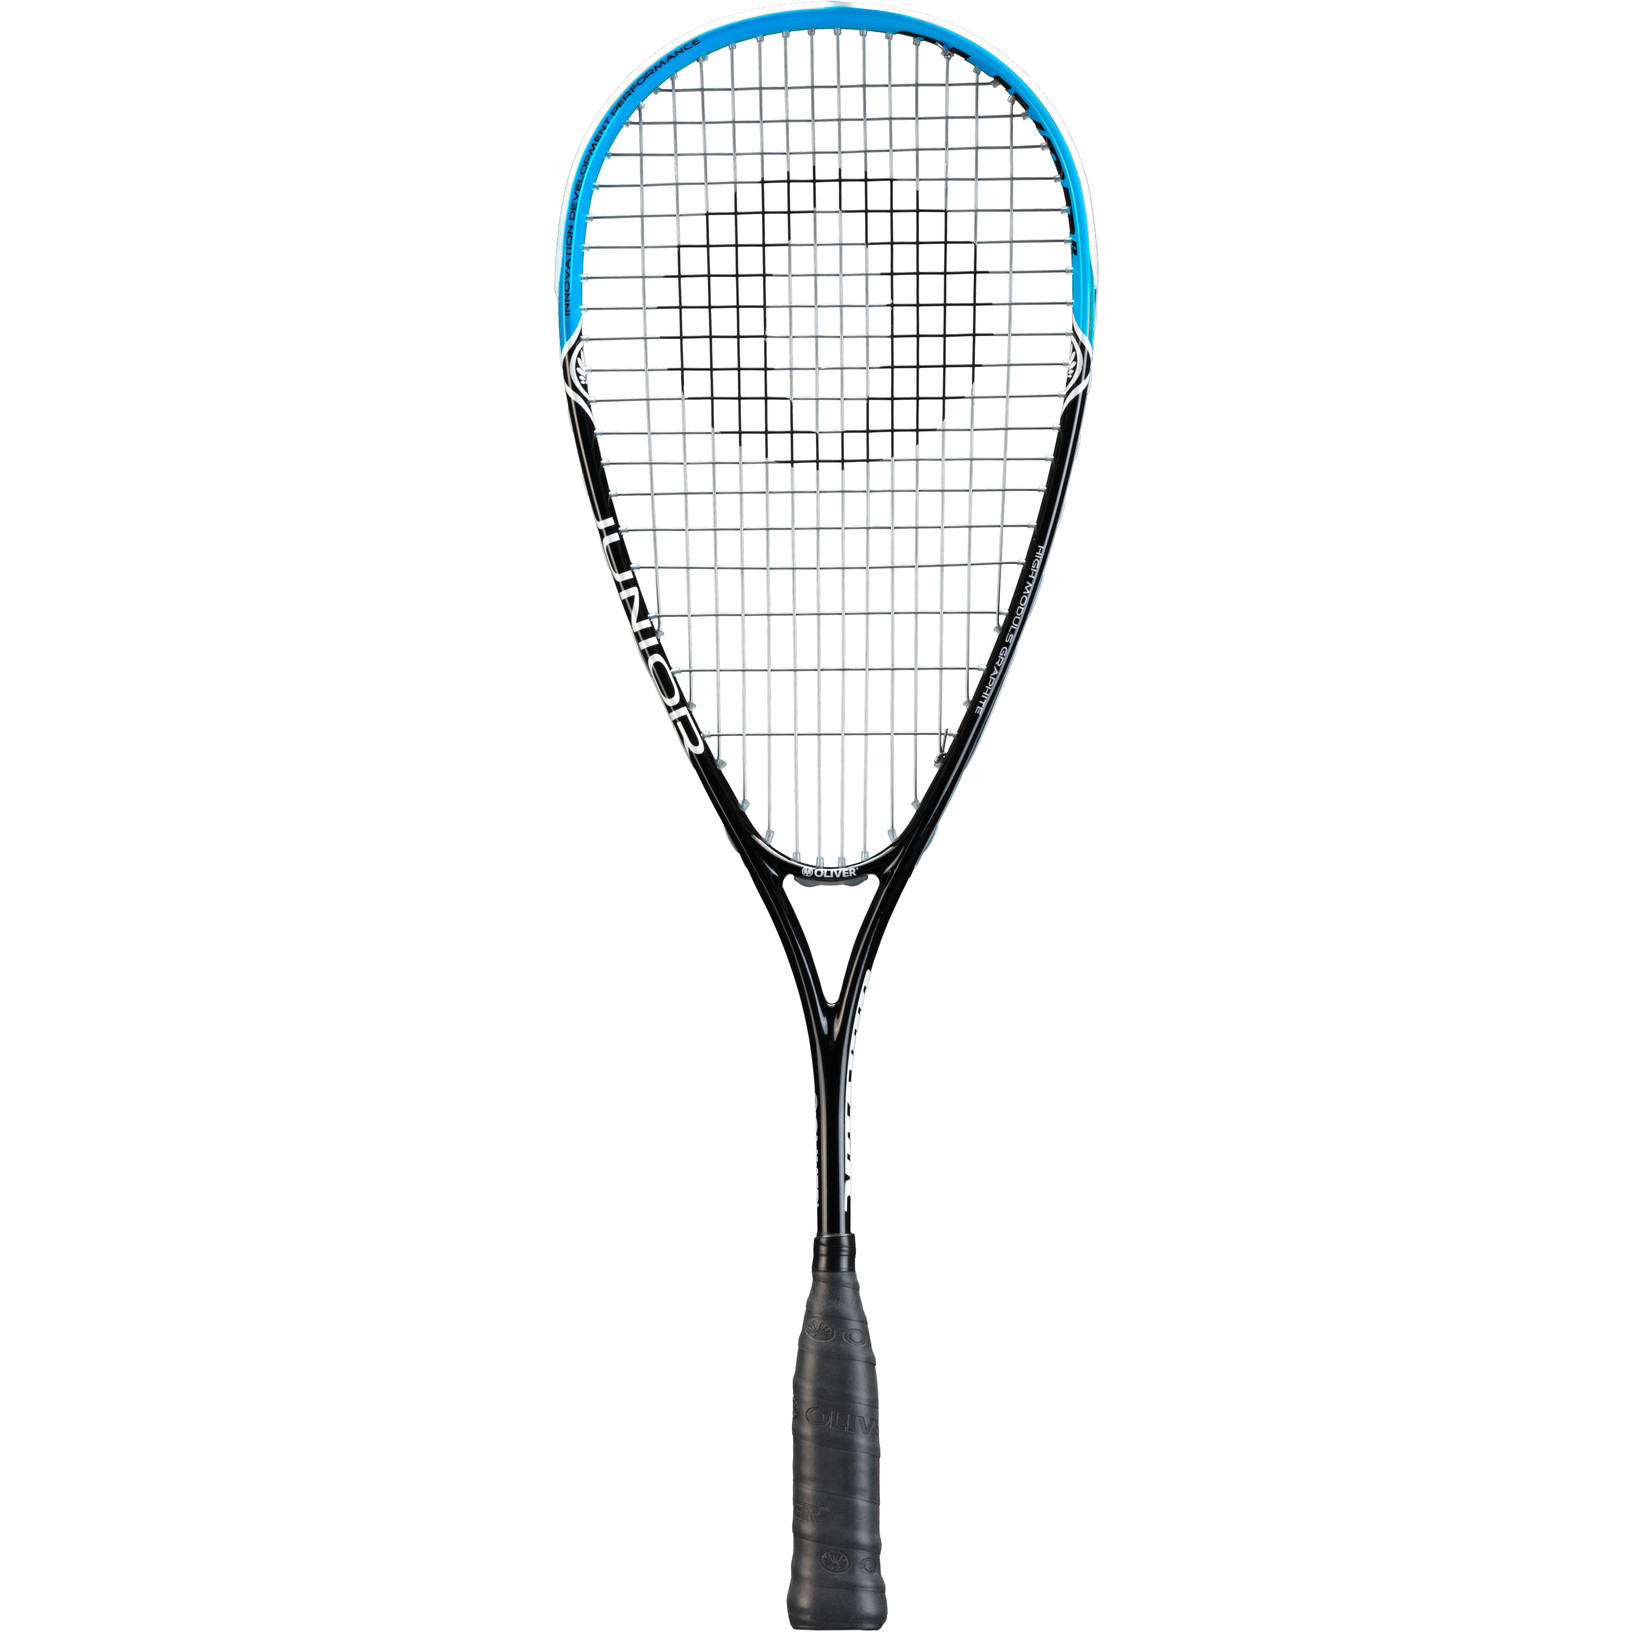 Oliver Junior Jnr. squashracket